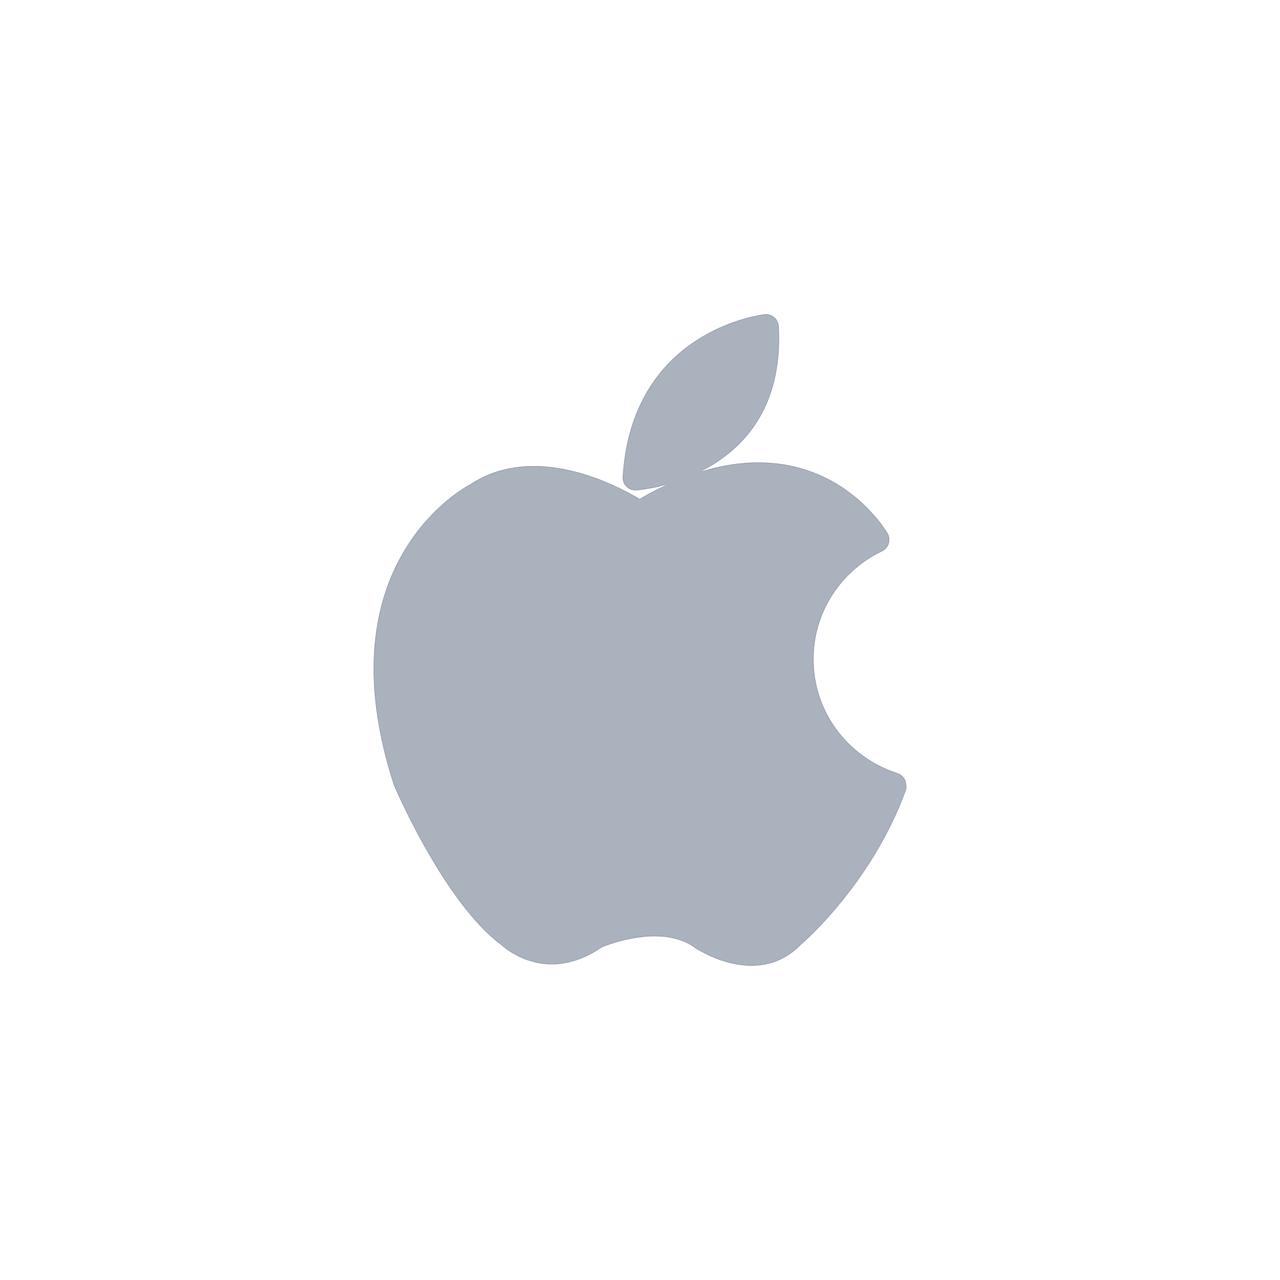 Apple verhelpt kritieke lekken in MacOS, iOS, iTunes en Safari